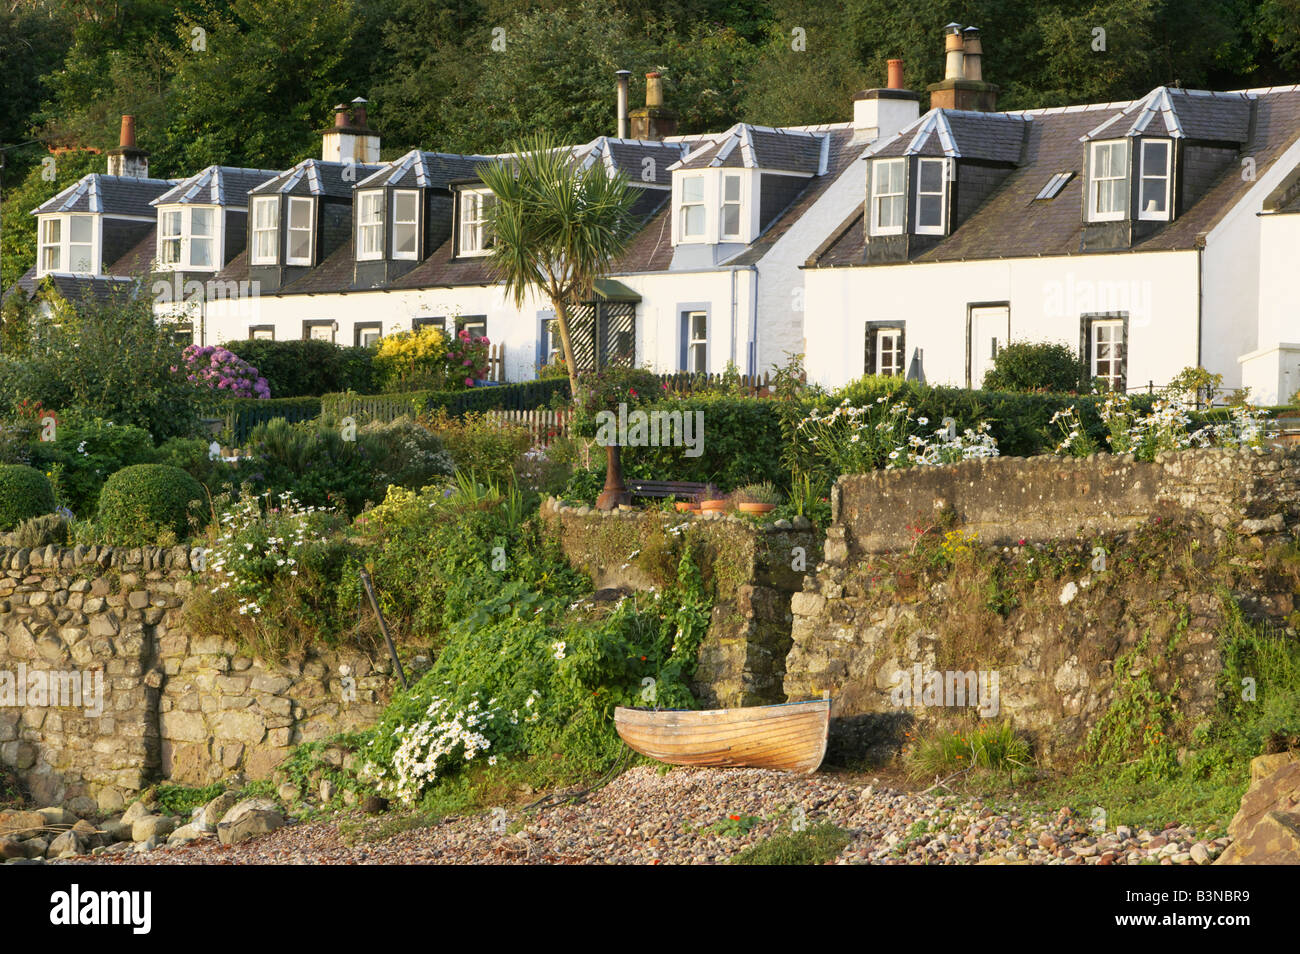 Corrie, Isle of Arran, North Ayrshire, Scotland, UK. - Stock Image